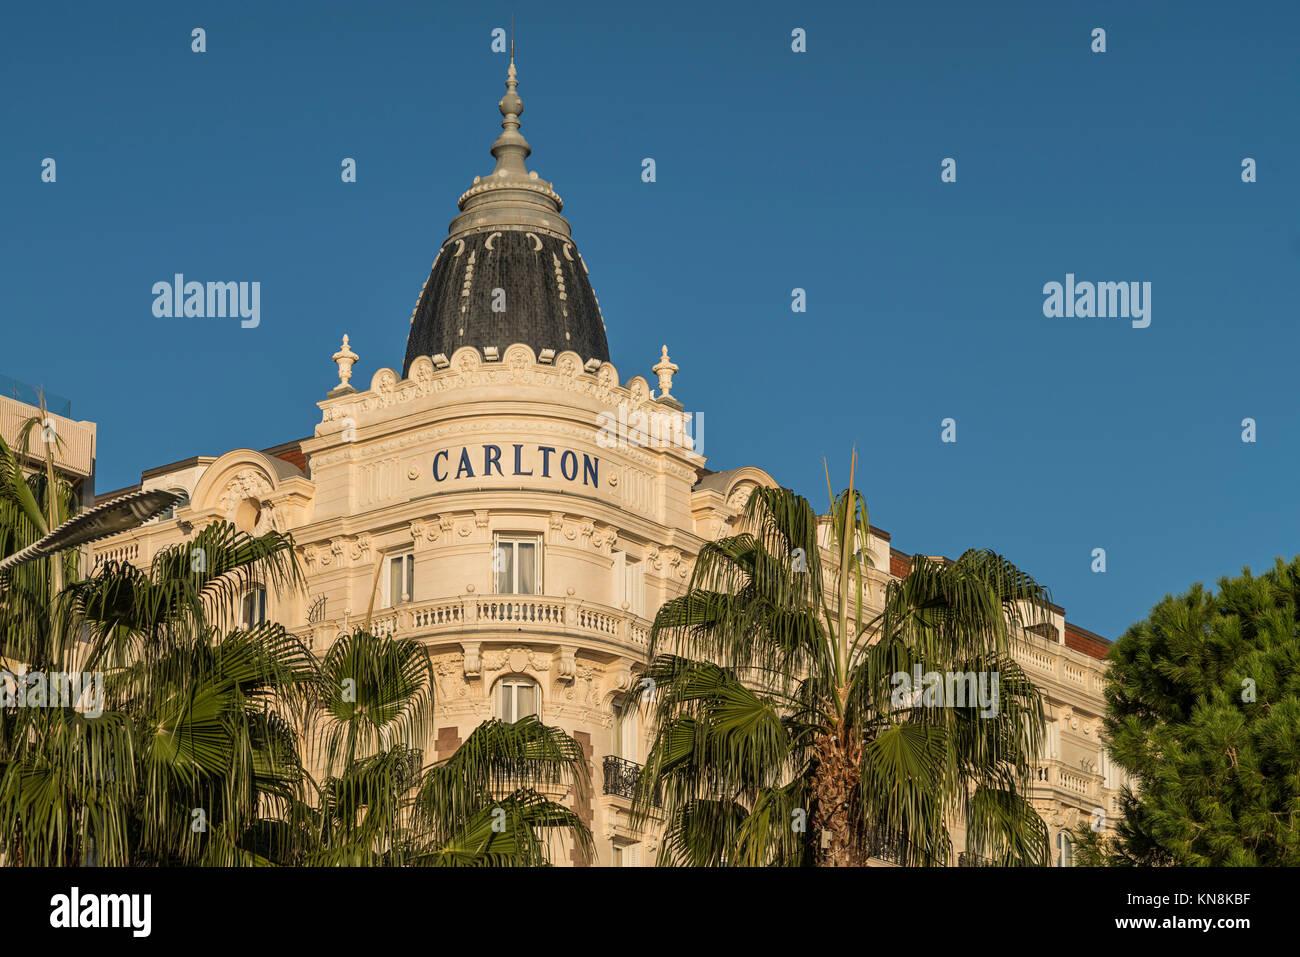 Carlton Hotel, Cannes, Alpes maritime,  Cote D'Azur, Provence, France - Stock Image